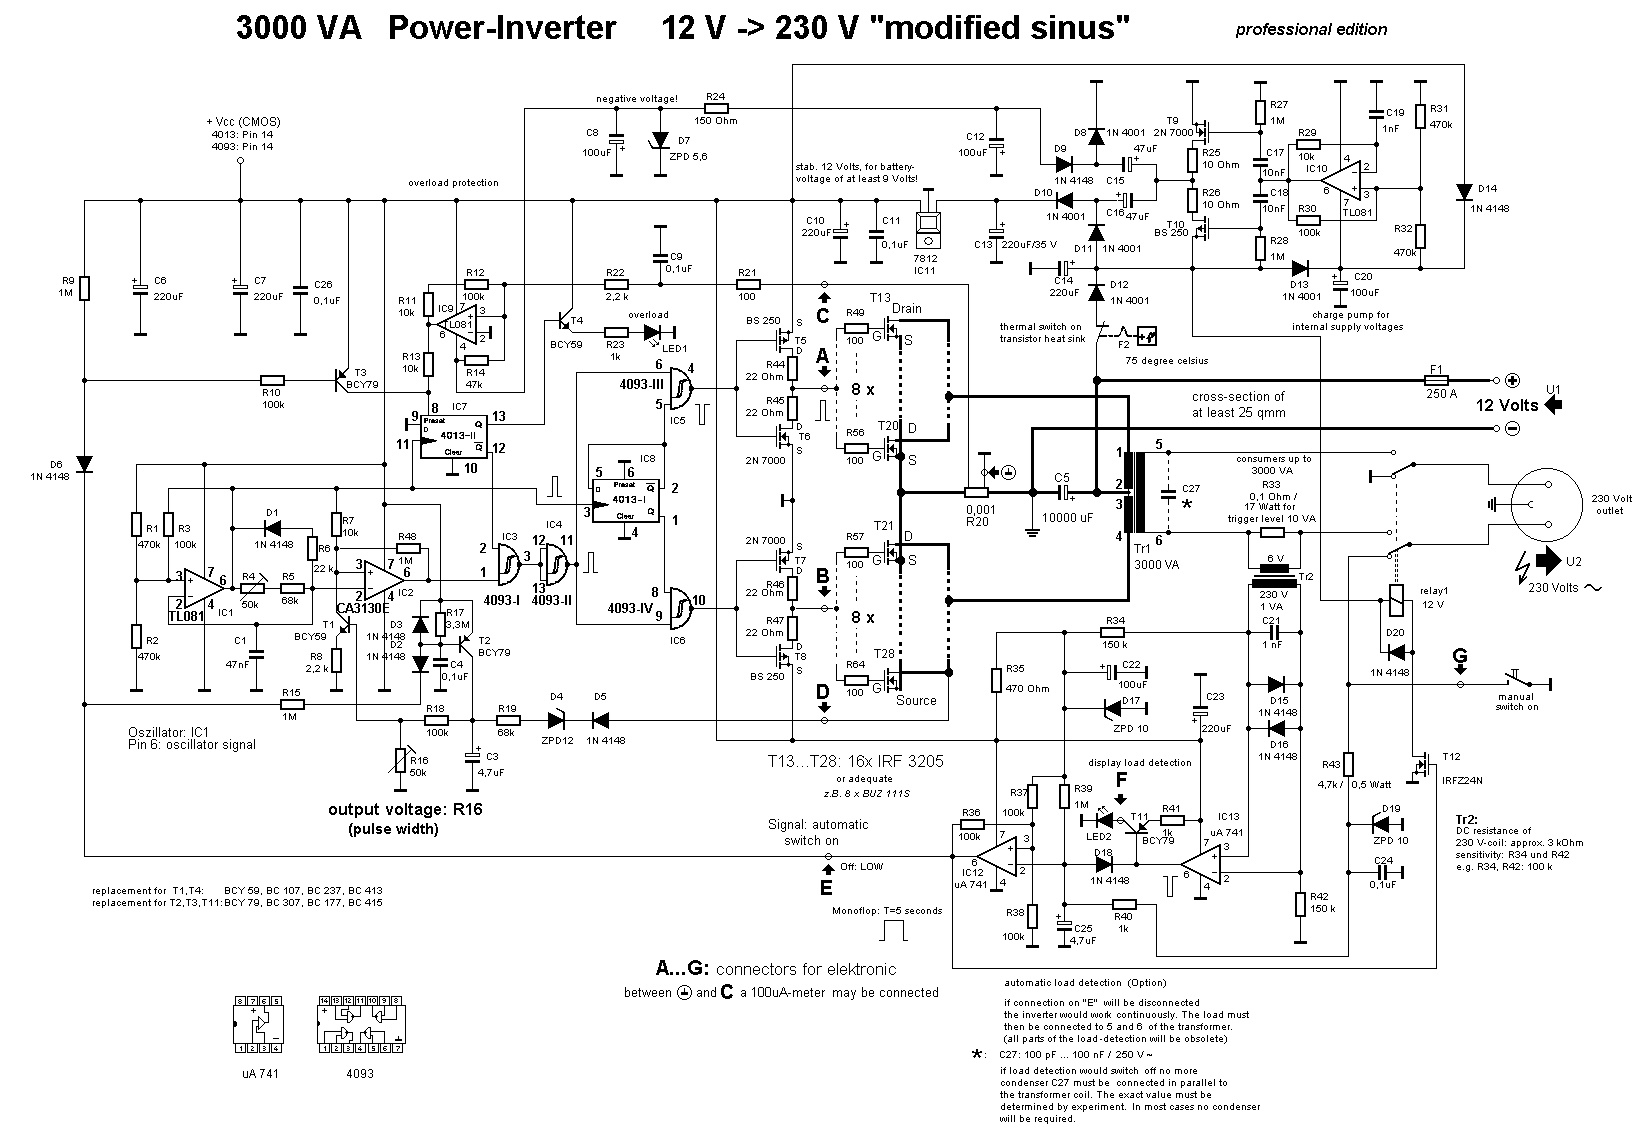 3000w inverter wiring diagram trusted wiring diagram u2022 rh soulmatestyle co